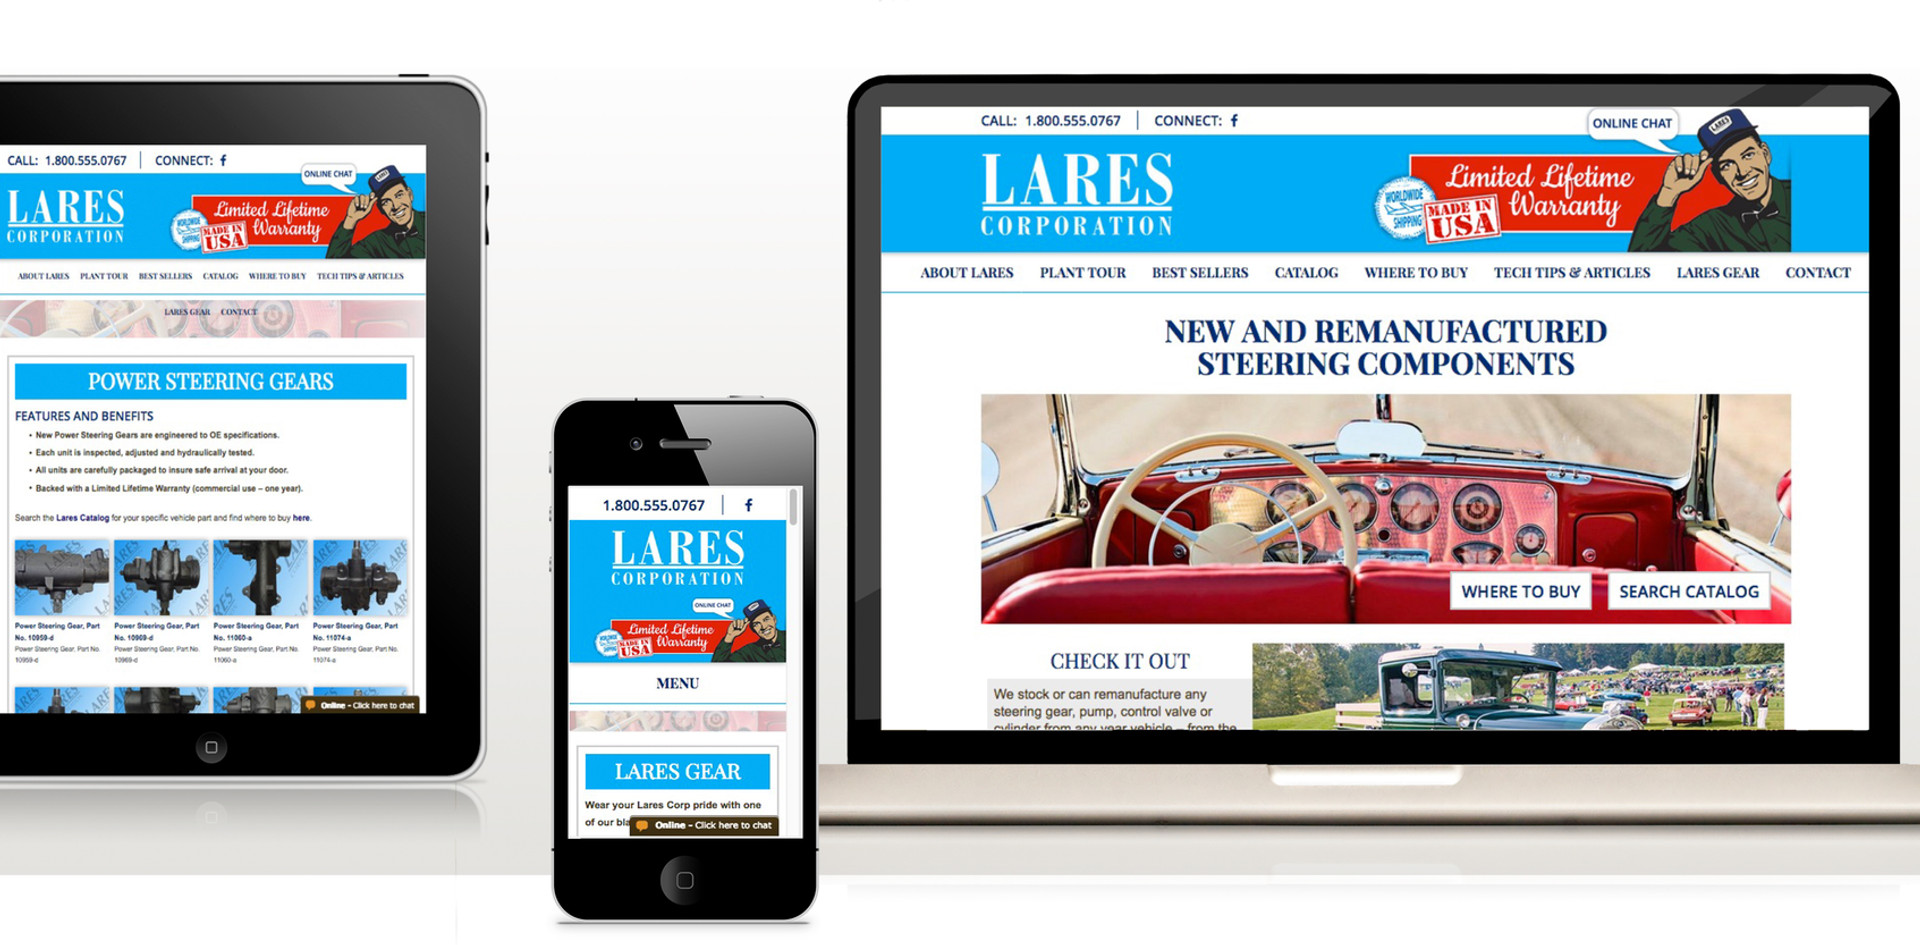 Lares Corporation